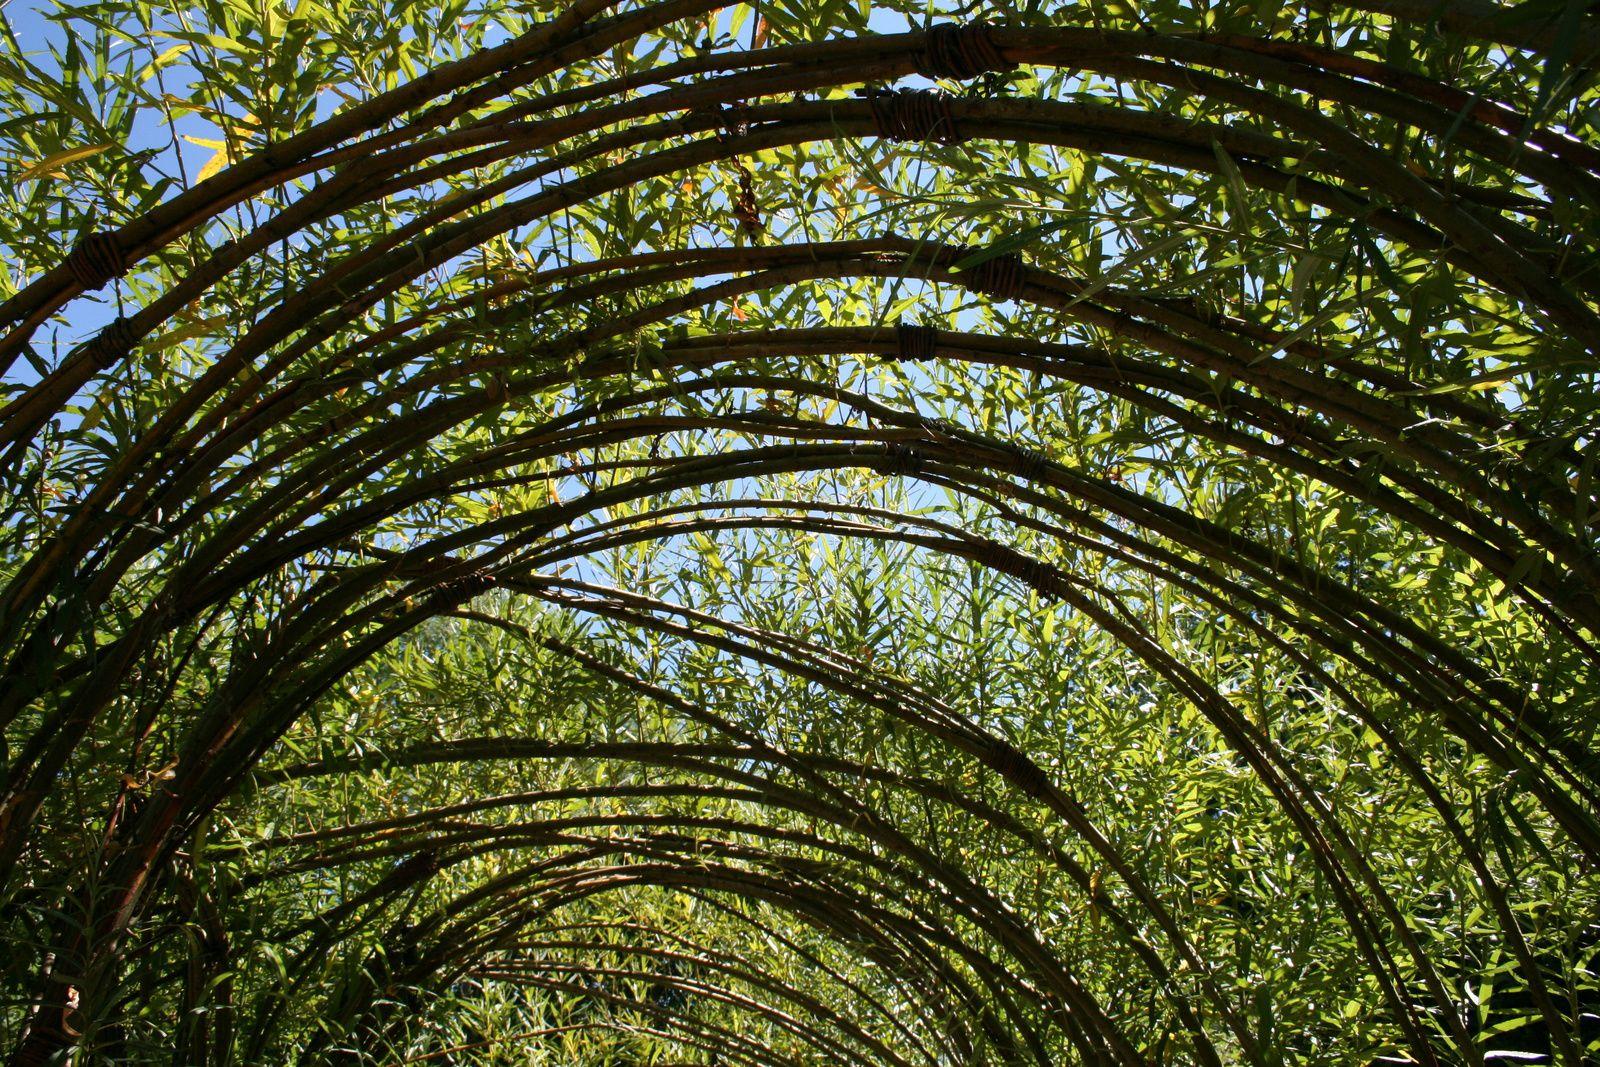 #structure #jardins #exposition #chaumontsurloire #charlotteblabla blog